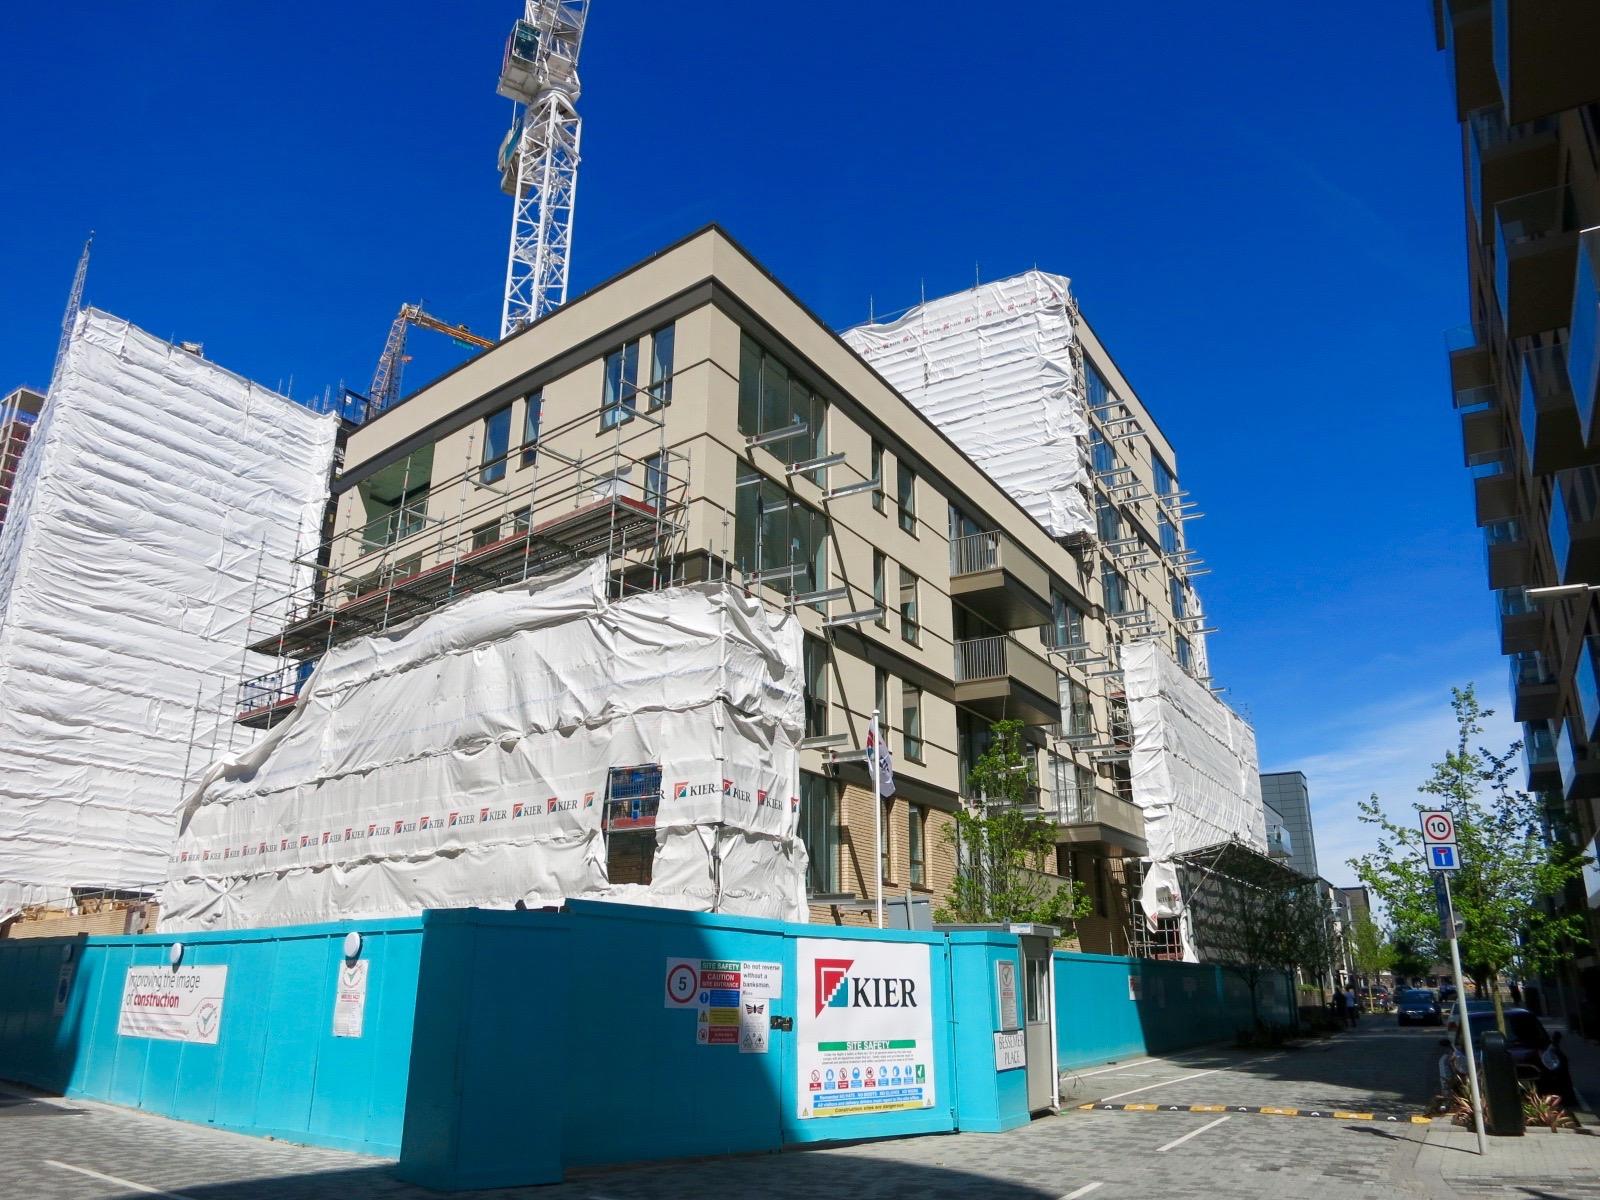 Construction progress of The Fulmar -  May 2016  [greenpen.london]